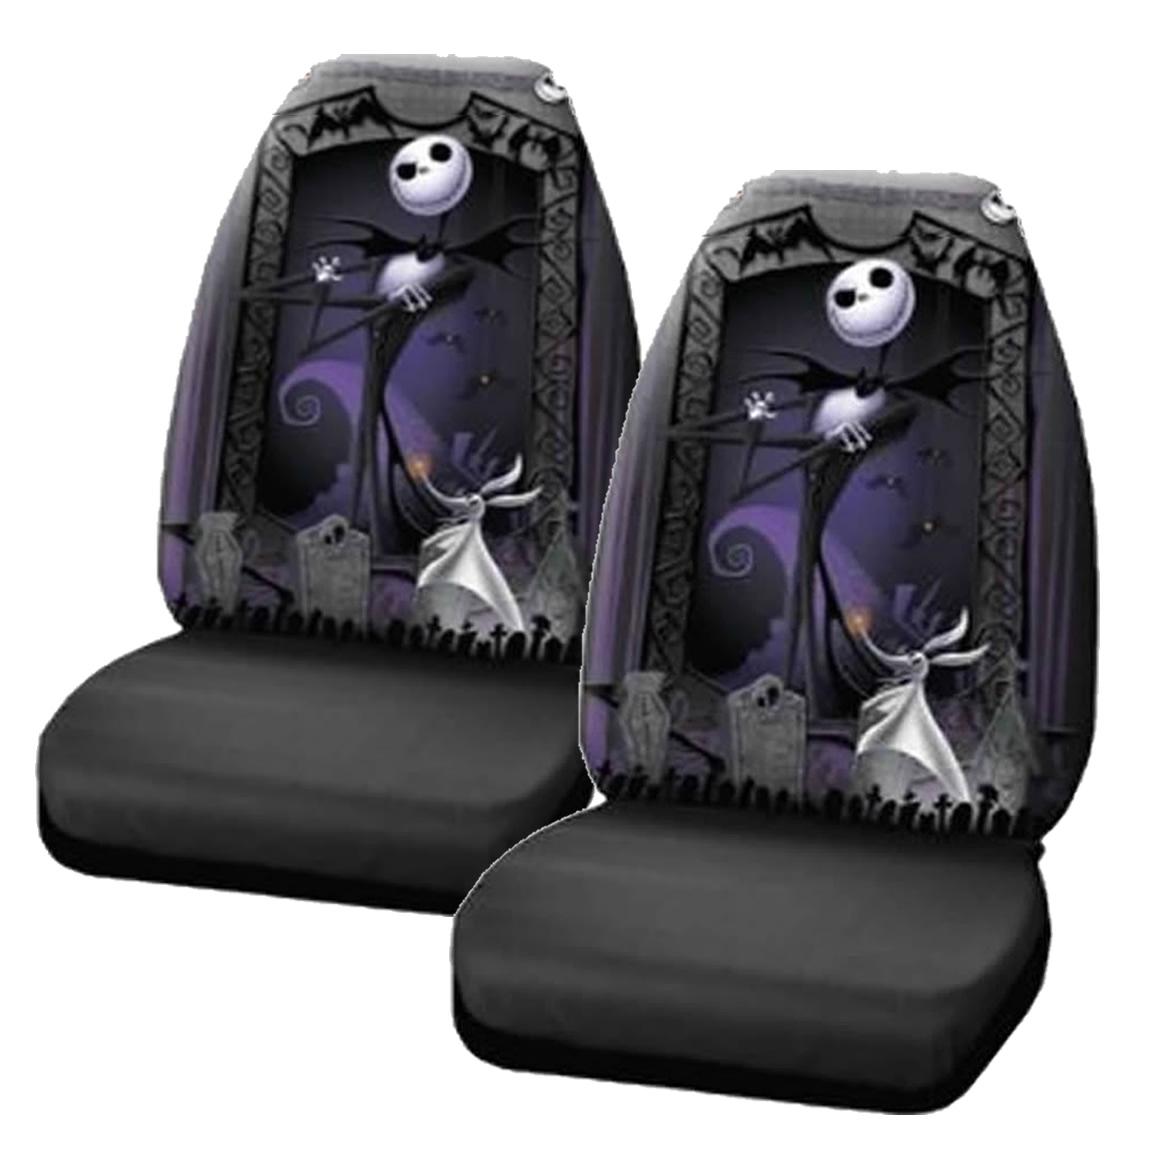 Jack Skellington Baby Car Seat Covers